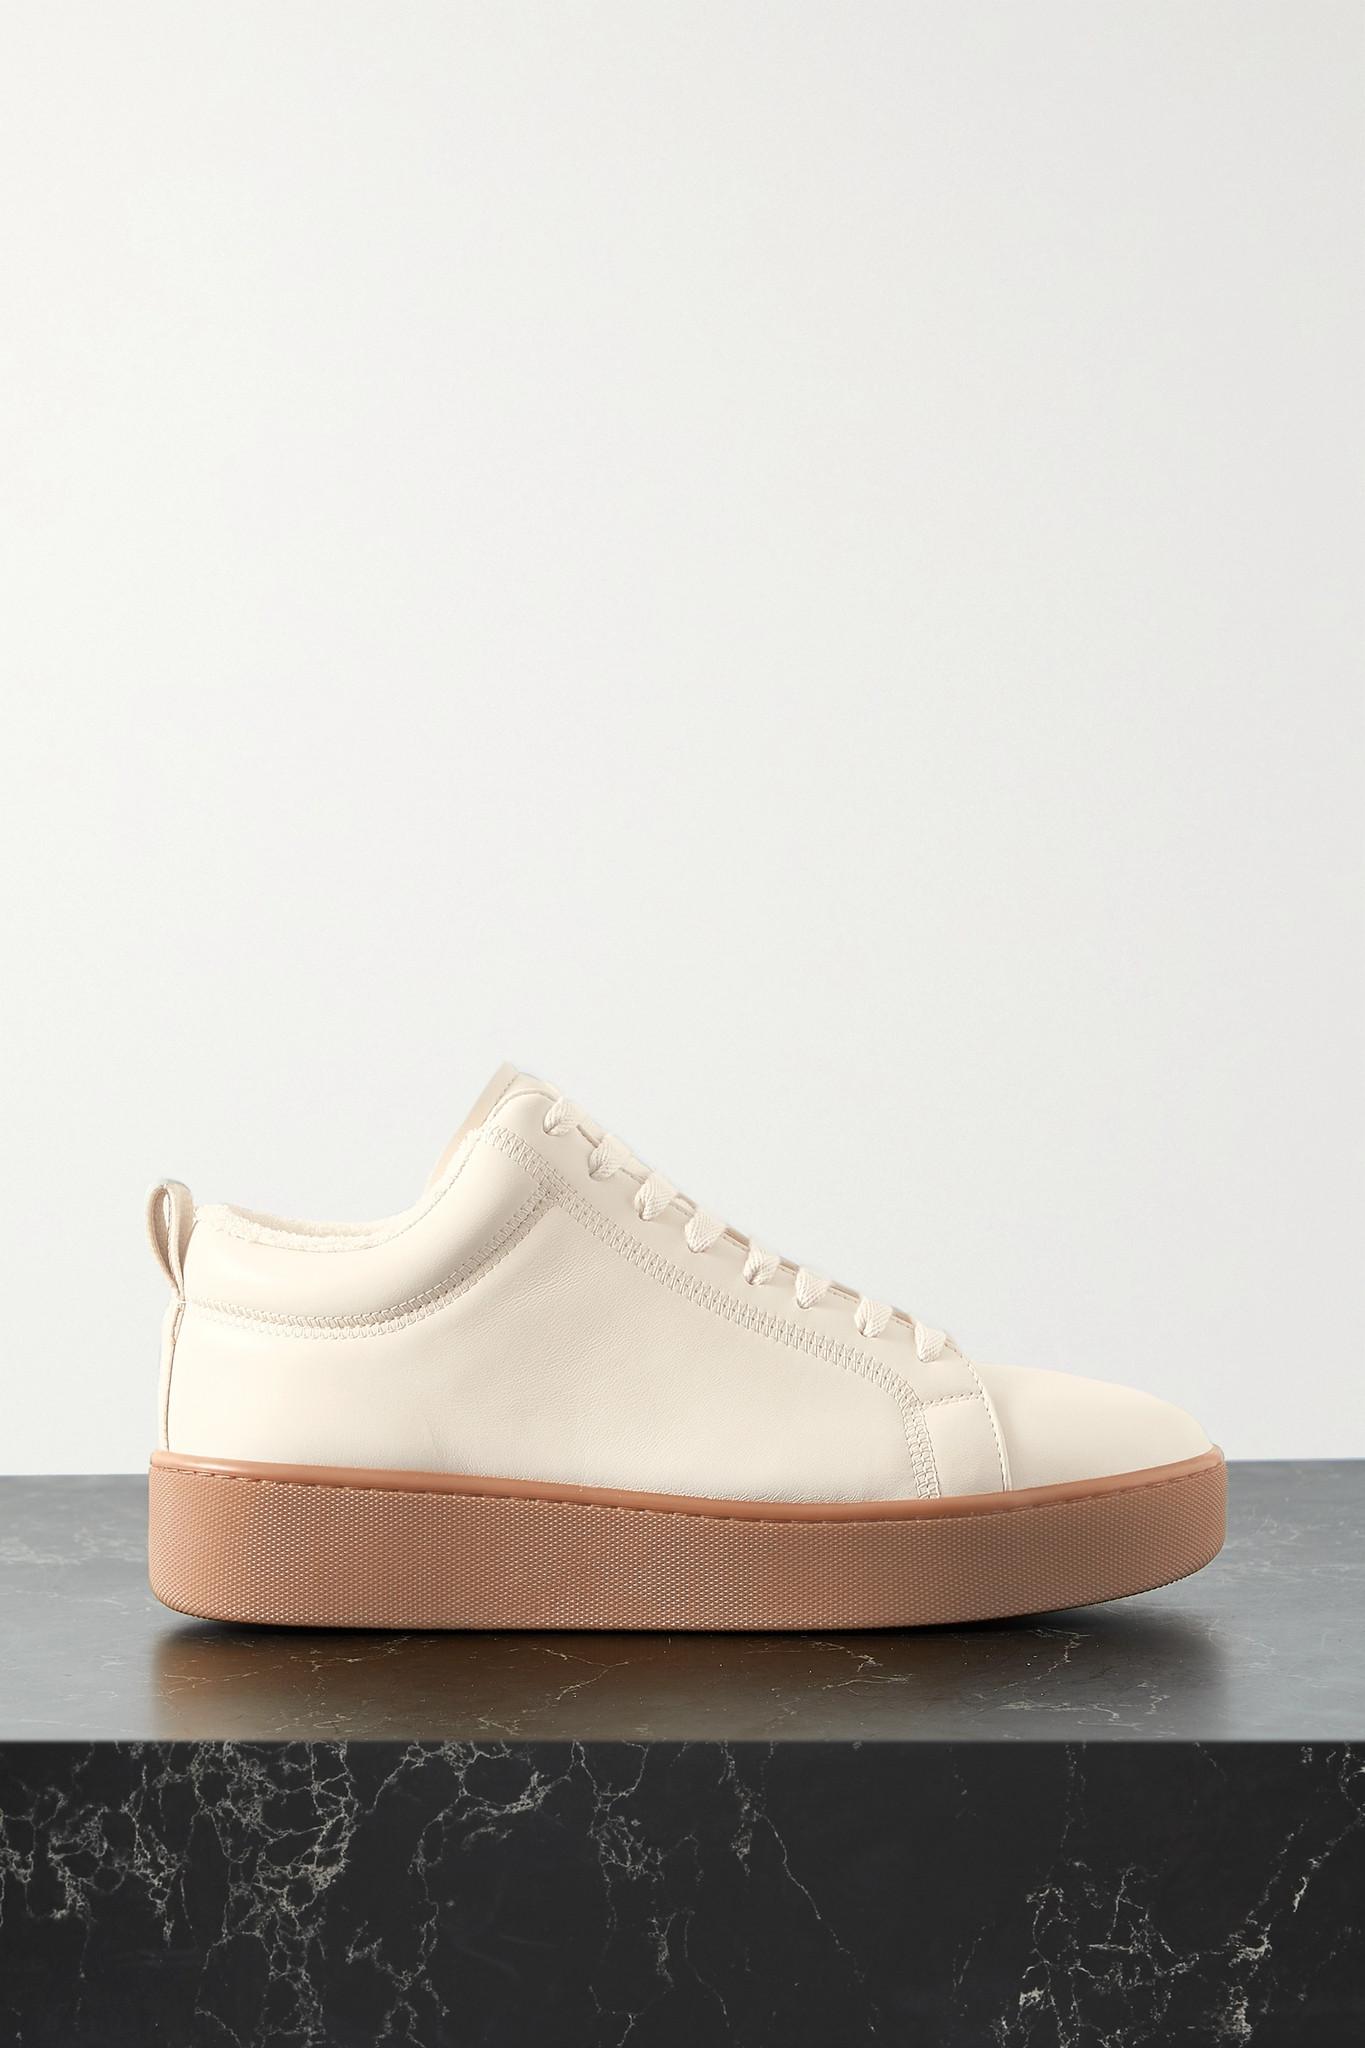 BOTTEGA VENETA - Leather Platform Sneakers - Off-white - IT36